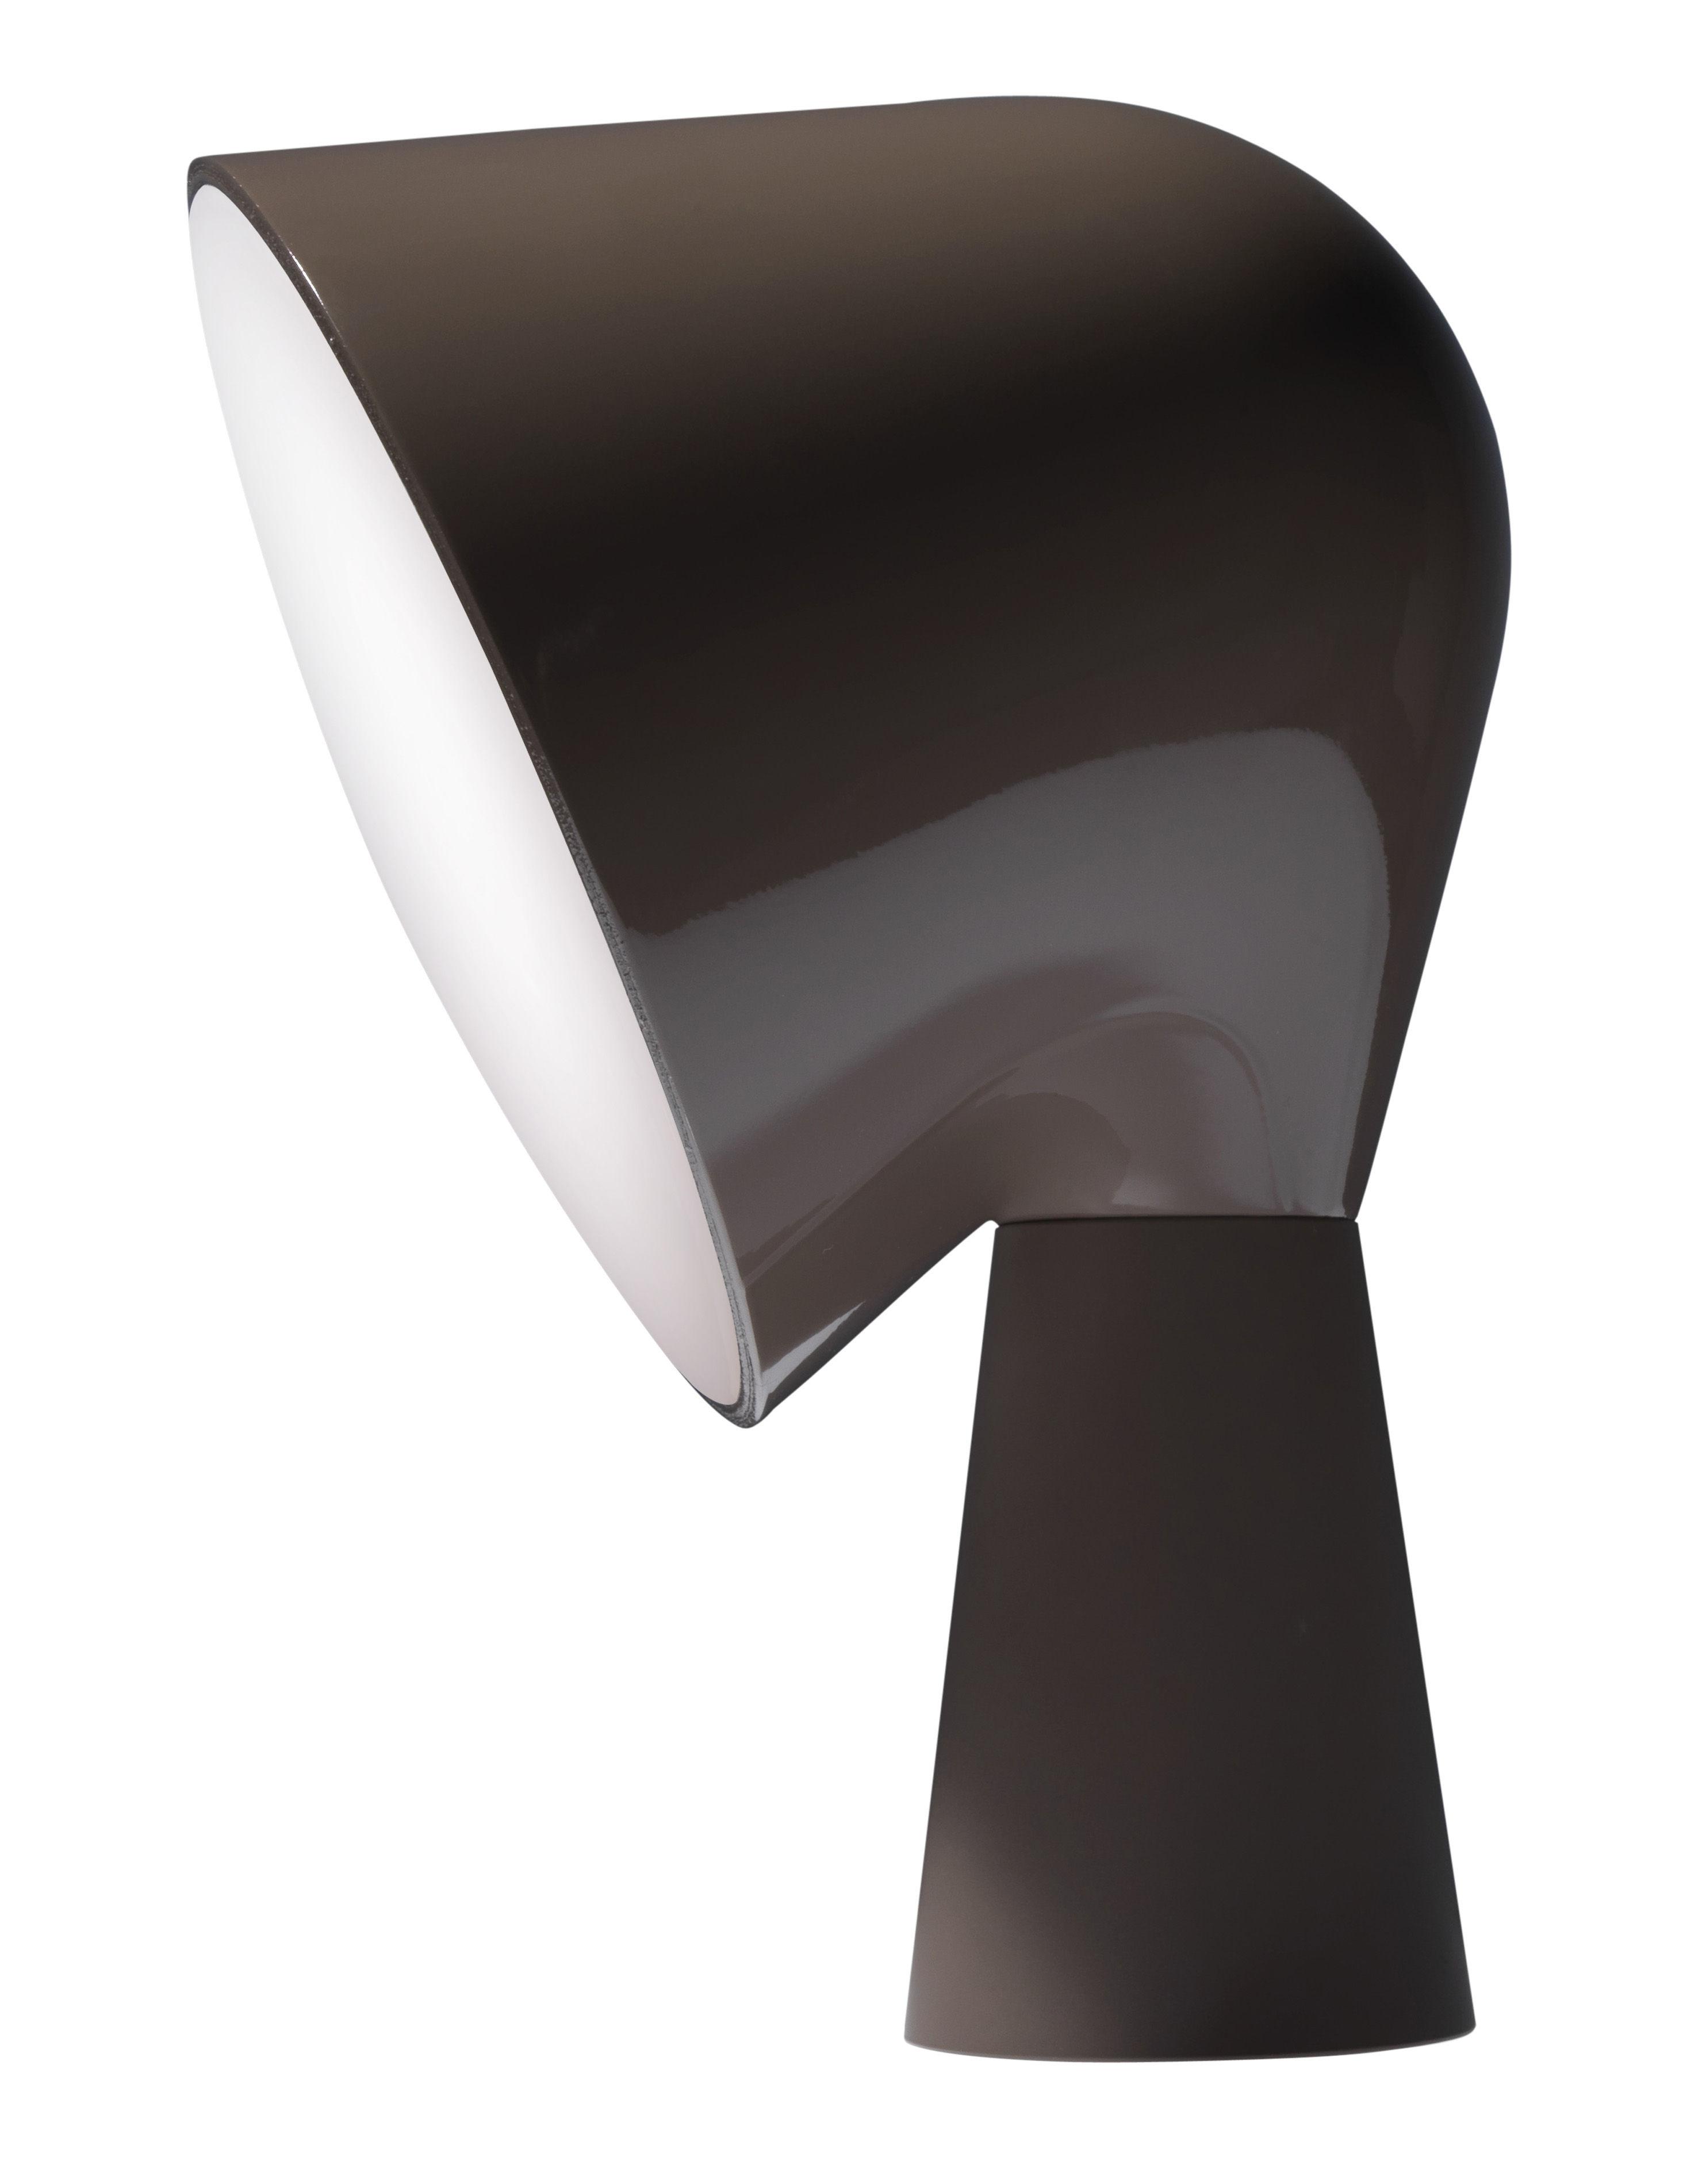 Luminaire - Lampes de table - Lampe de table Binic - Foscarini - Gris - ABS, Polycarbonate